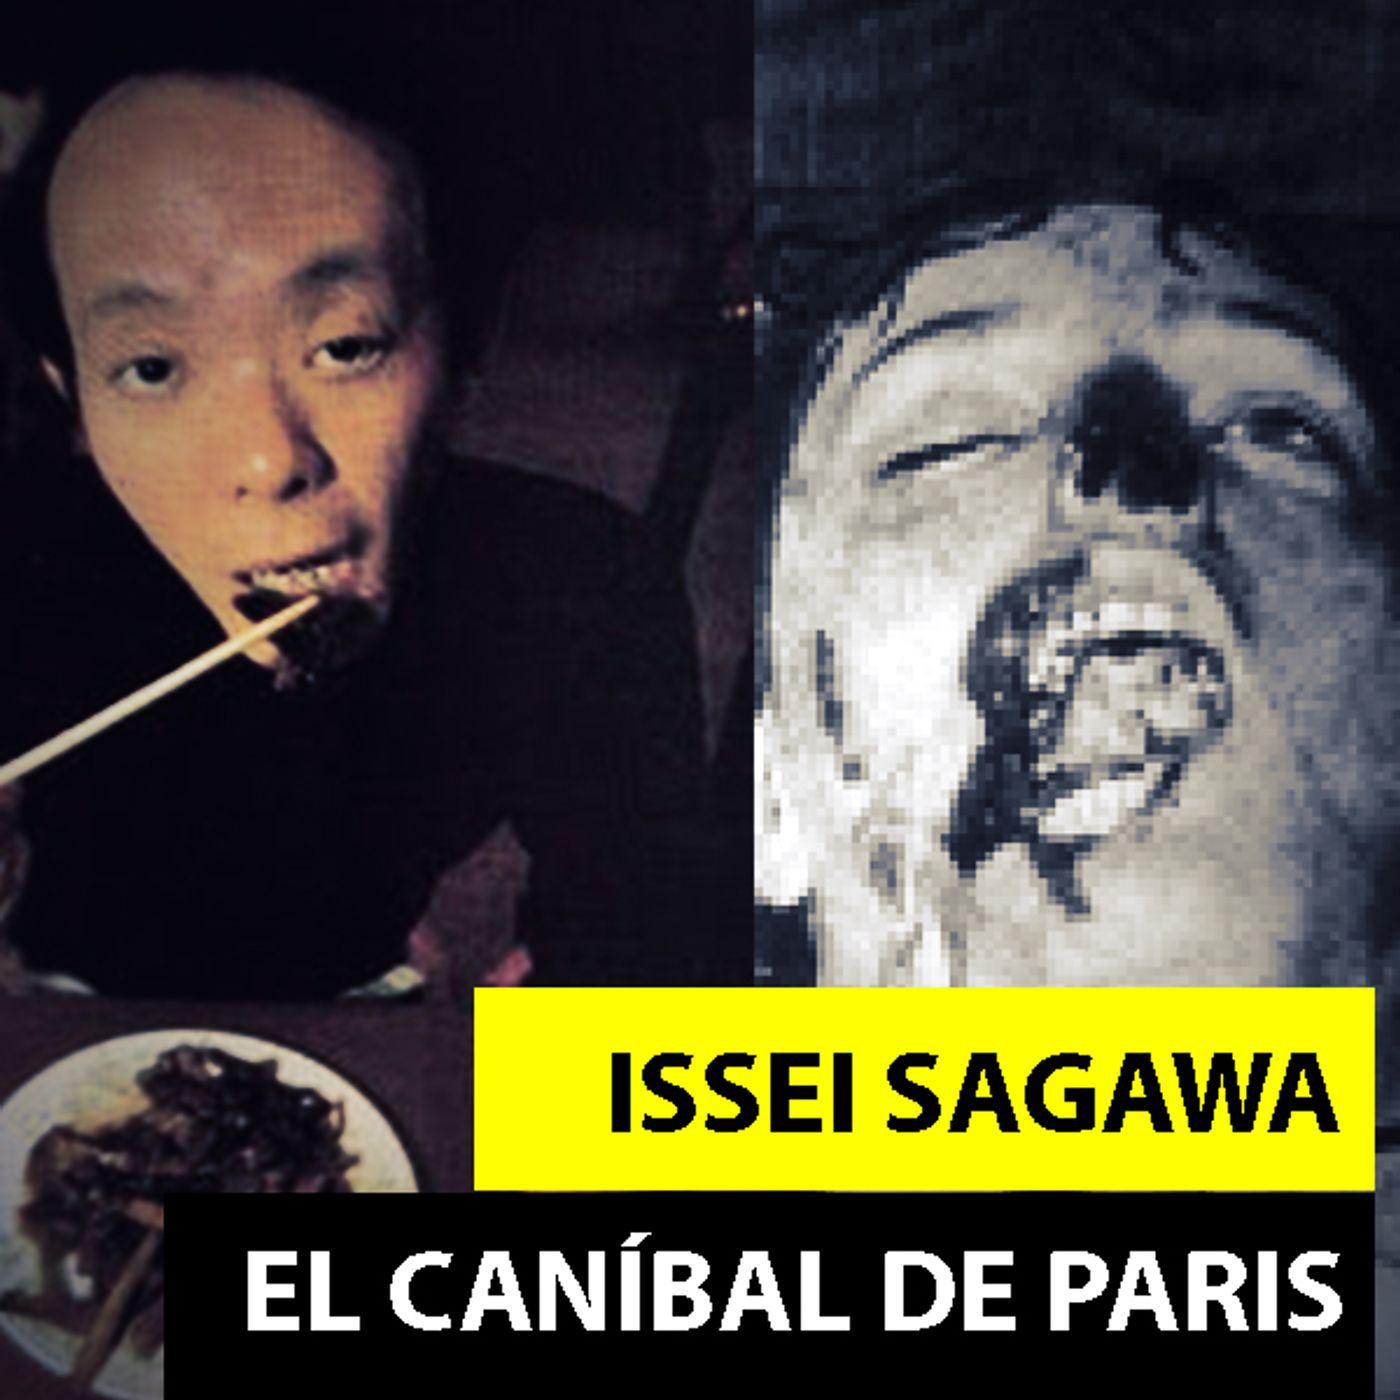 ISSEI SAGAWA | EL CANÍBAL DE PARIS